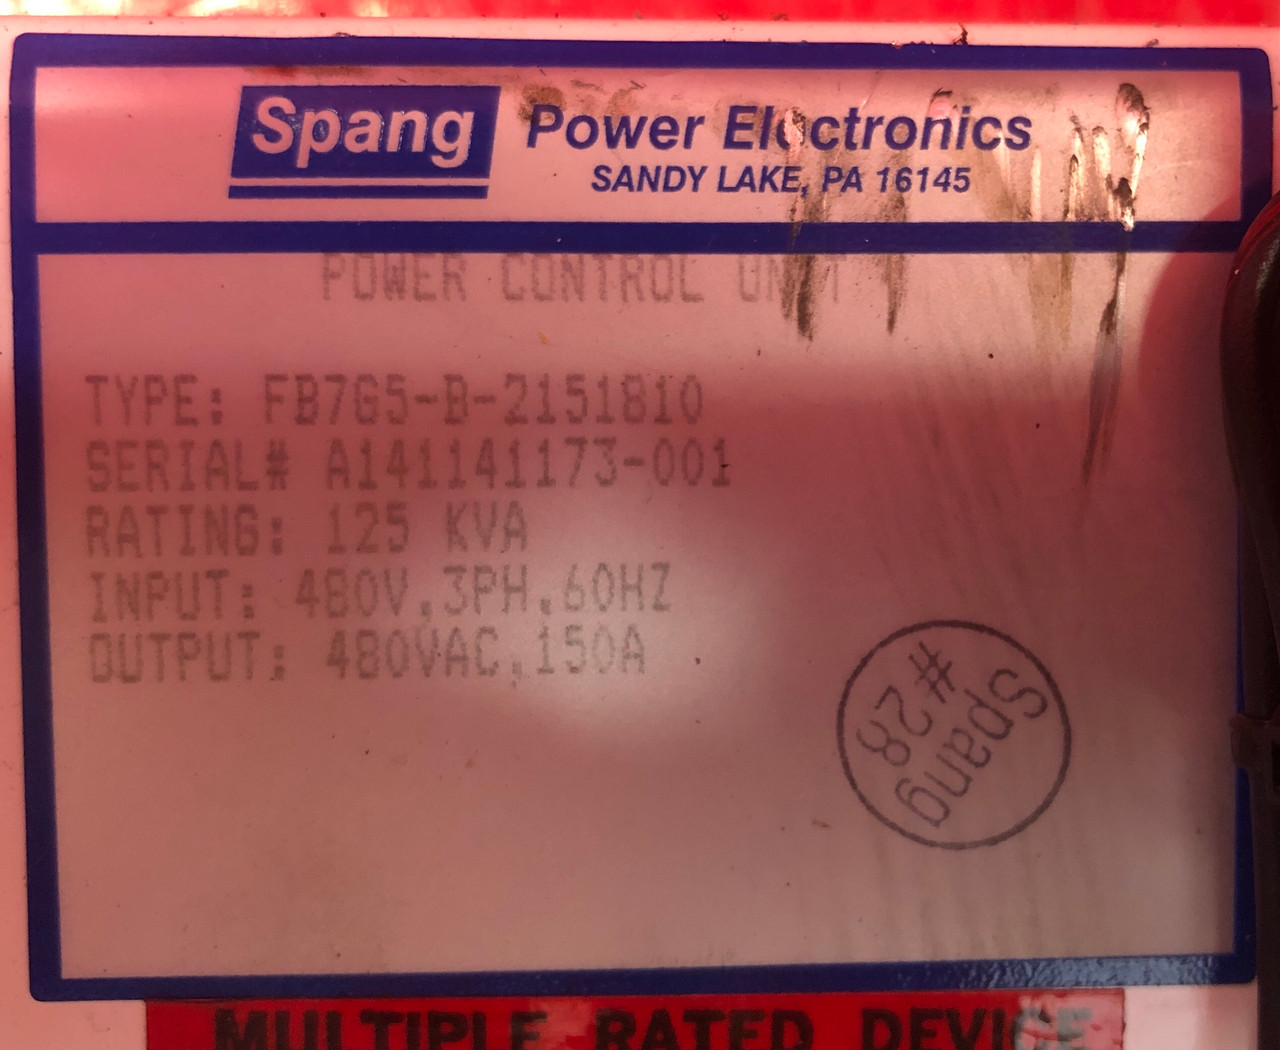 Spang FB7G5-B-2151810 Power Control Unit